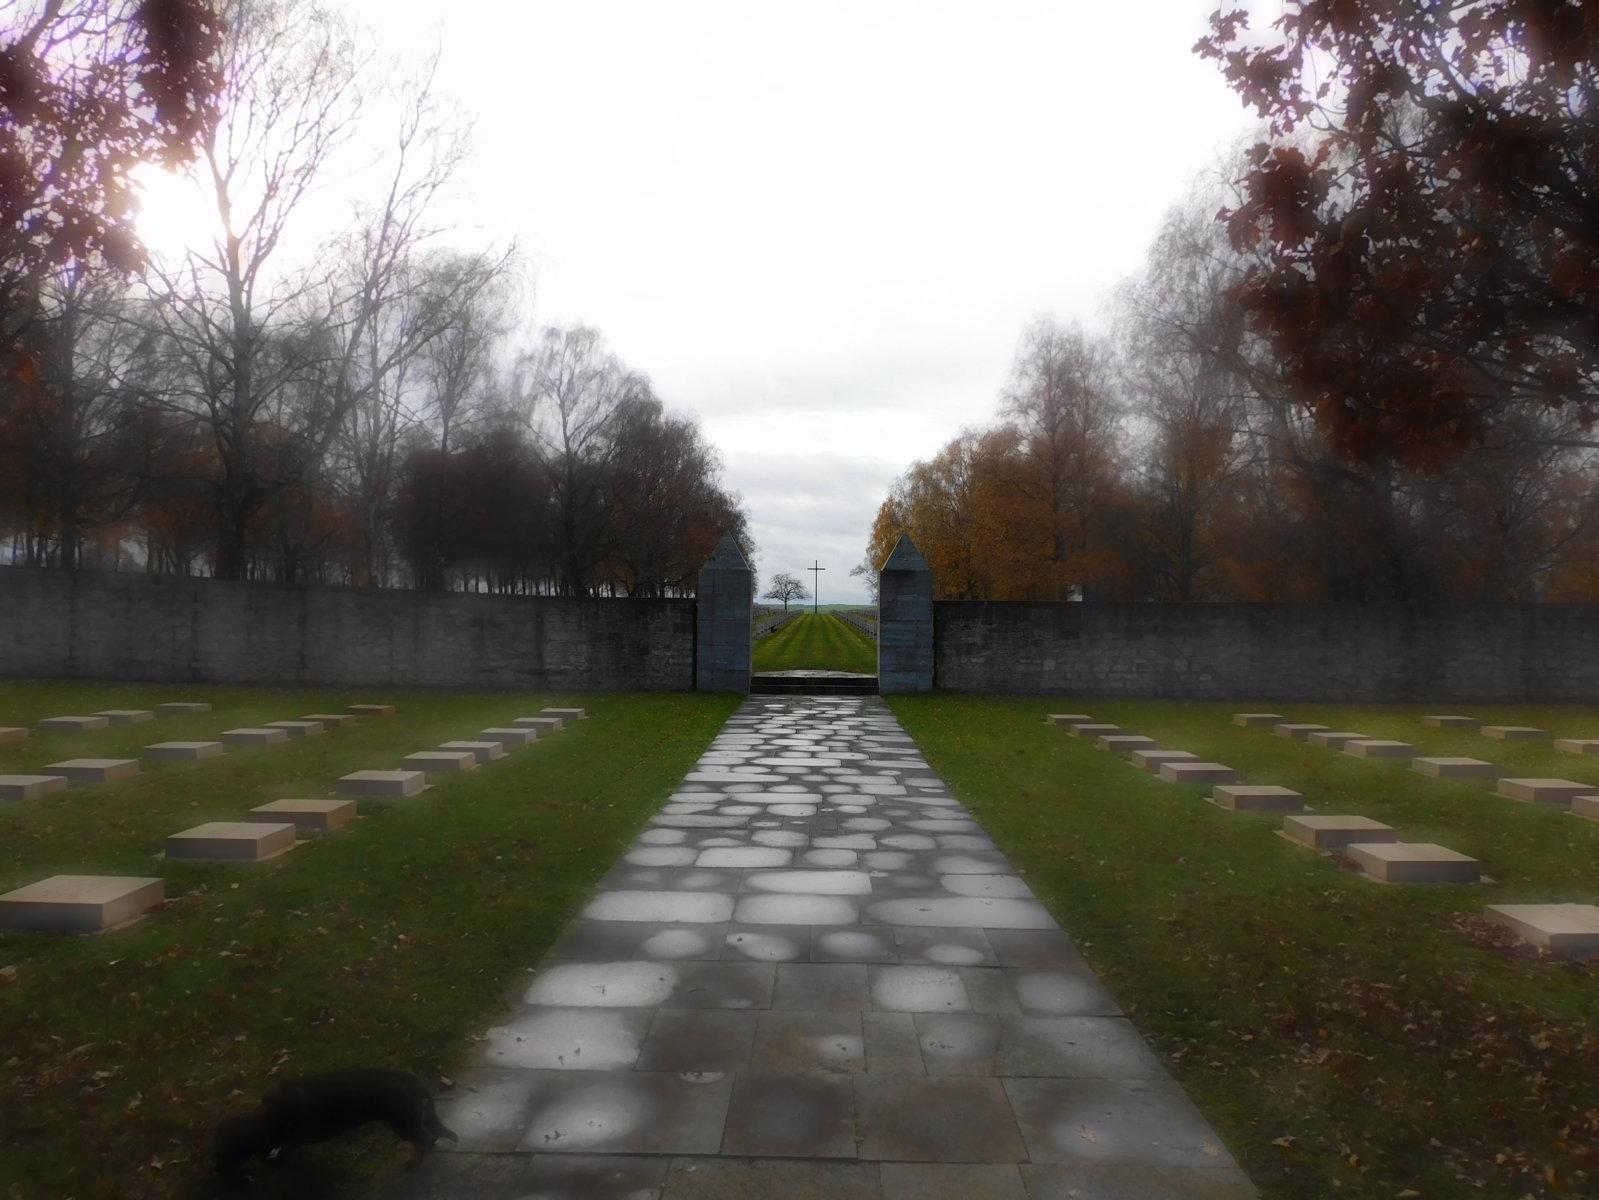 Der Eingang zum Soldatenfriedhof Bourbon